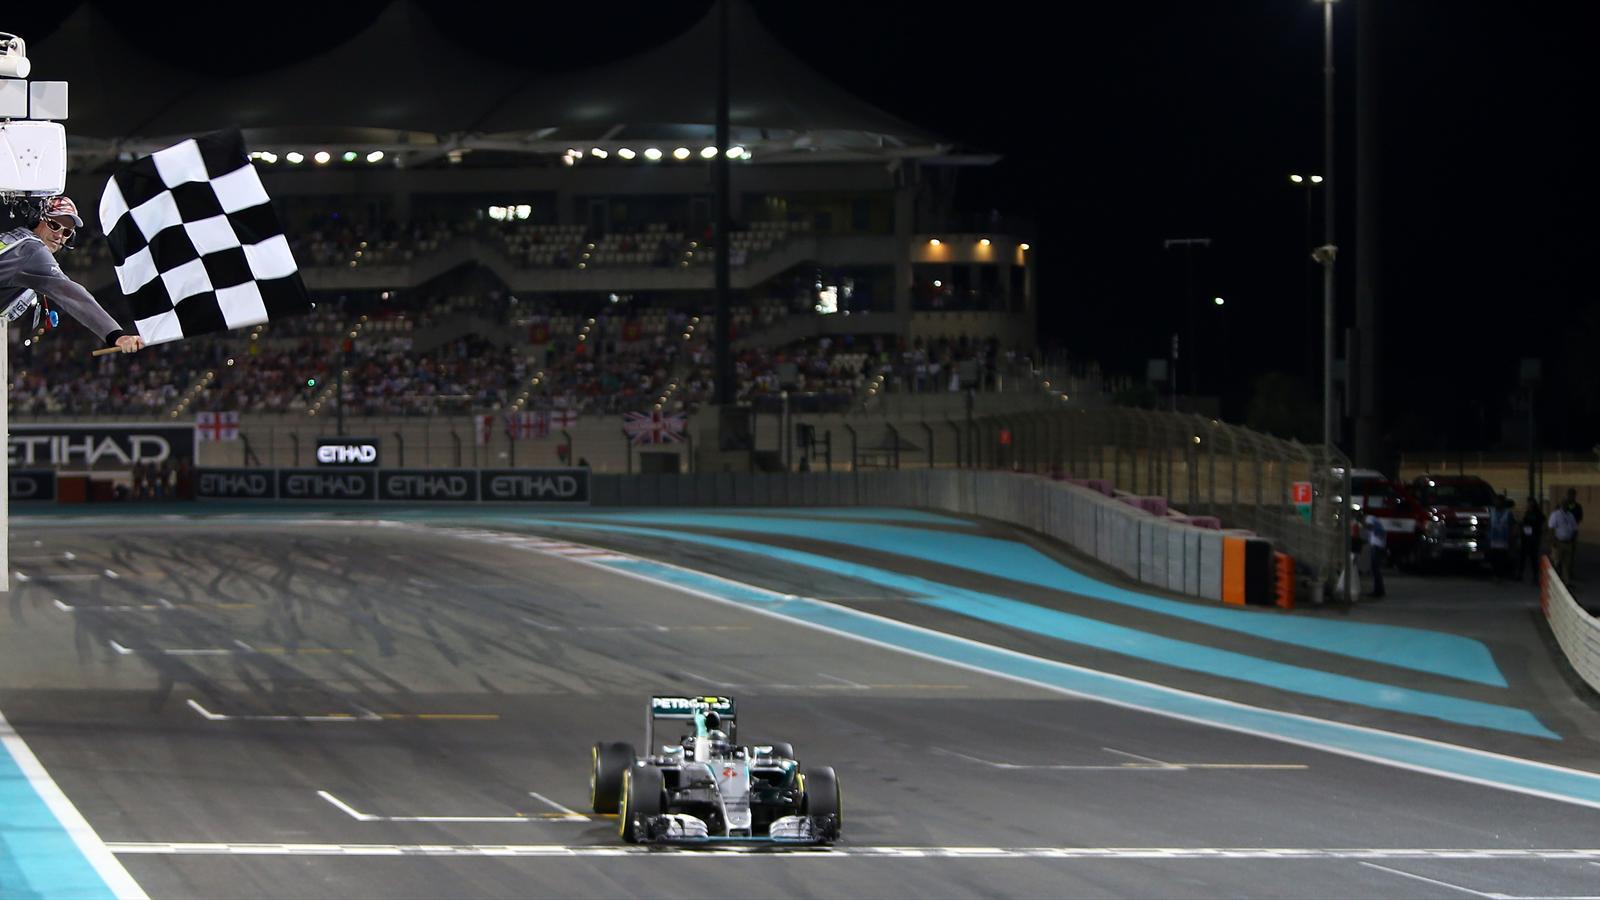 Nico Rosberg (Mercedes), vainqueur du Grand Prix d'Abou Dabi 2015